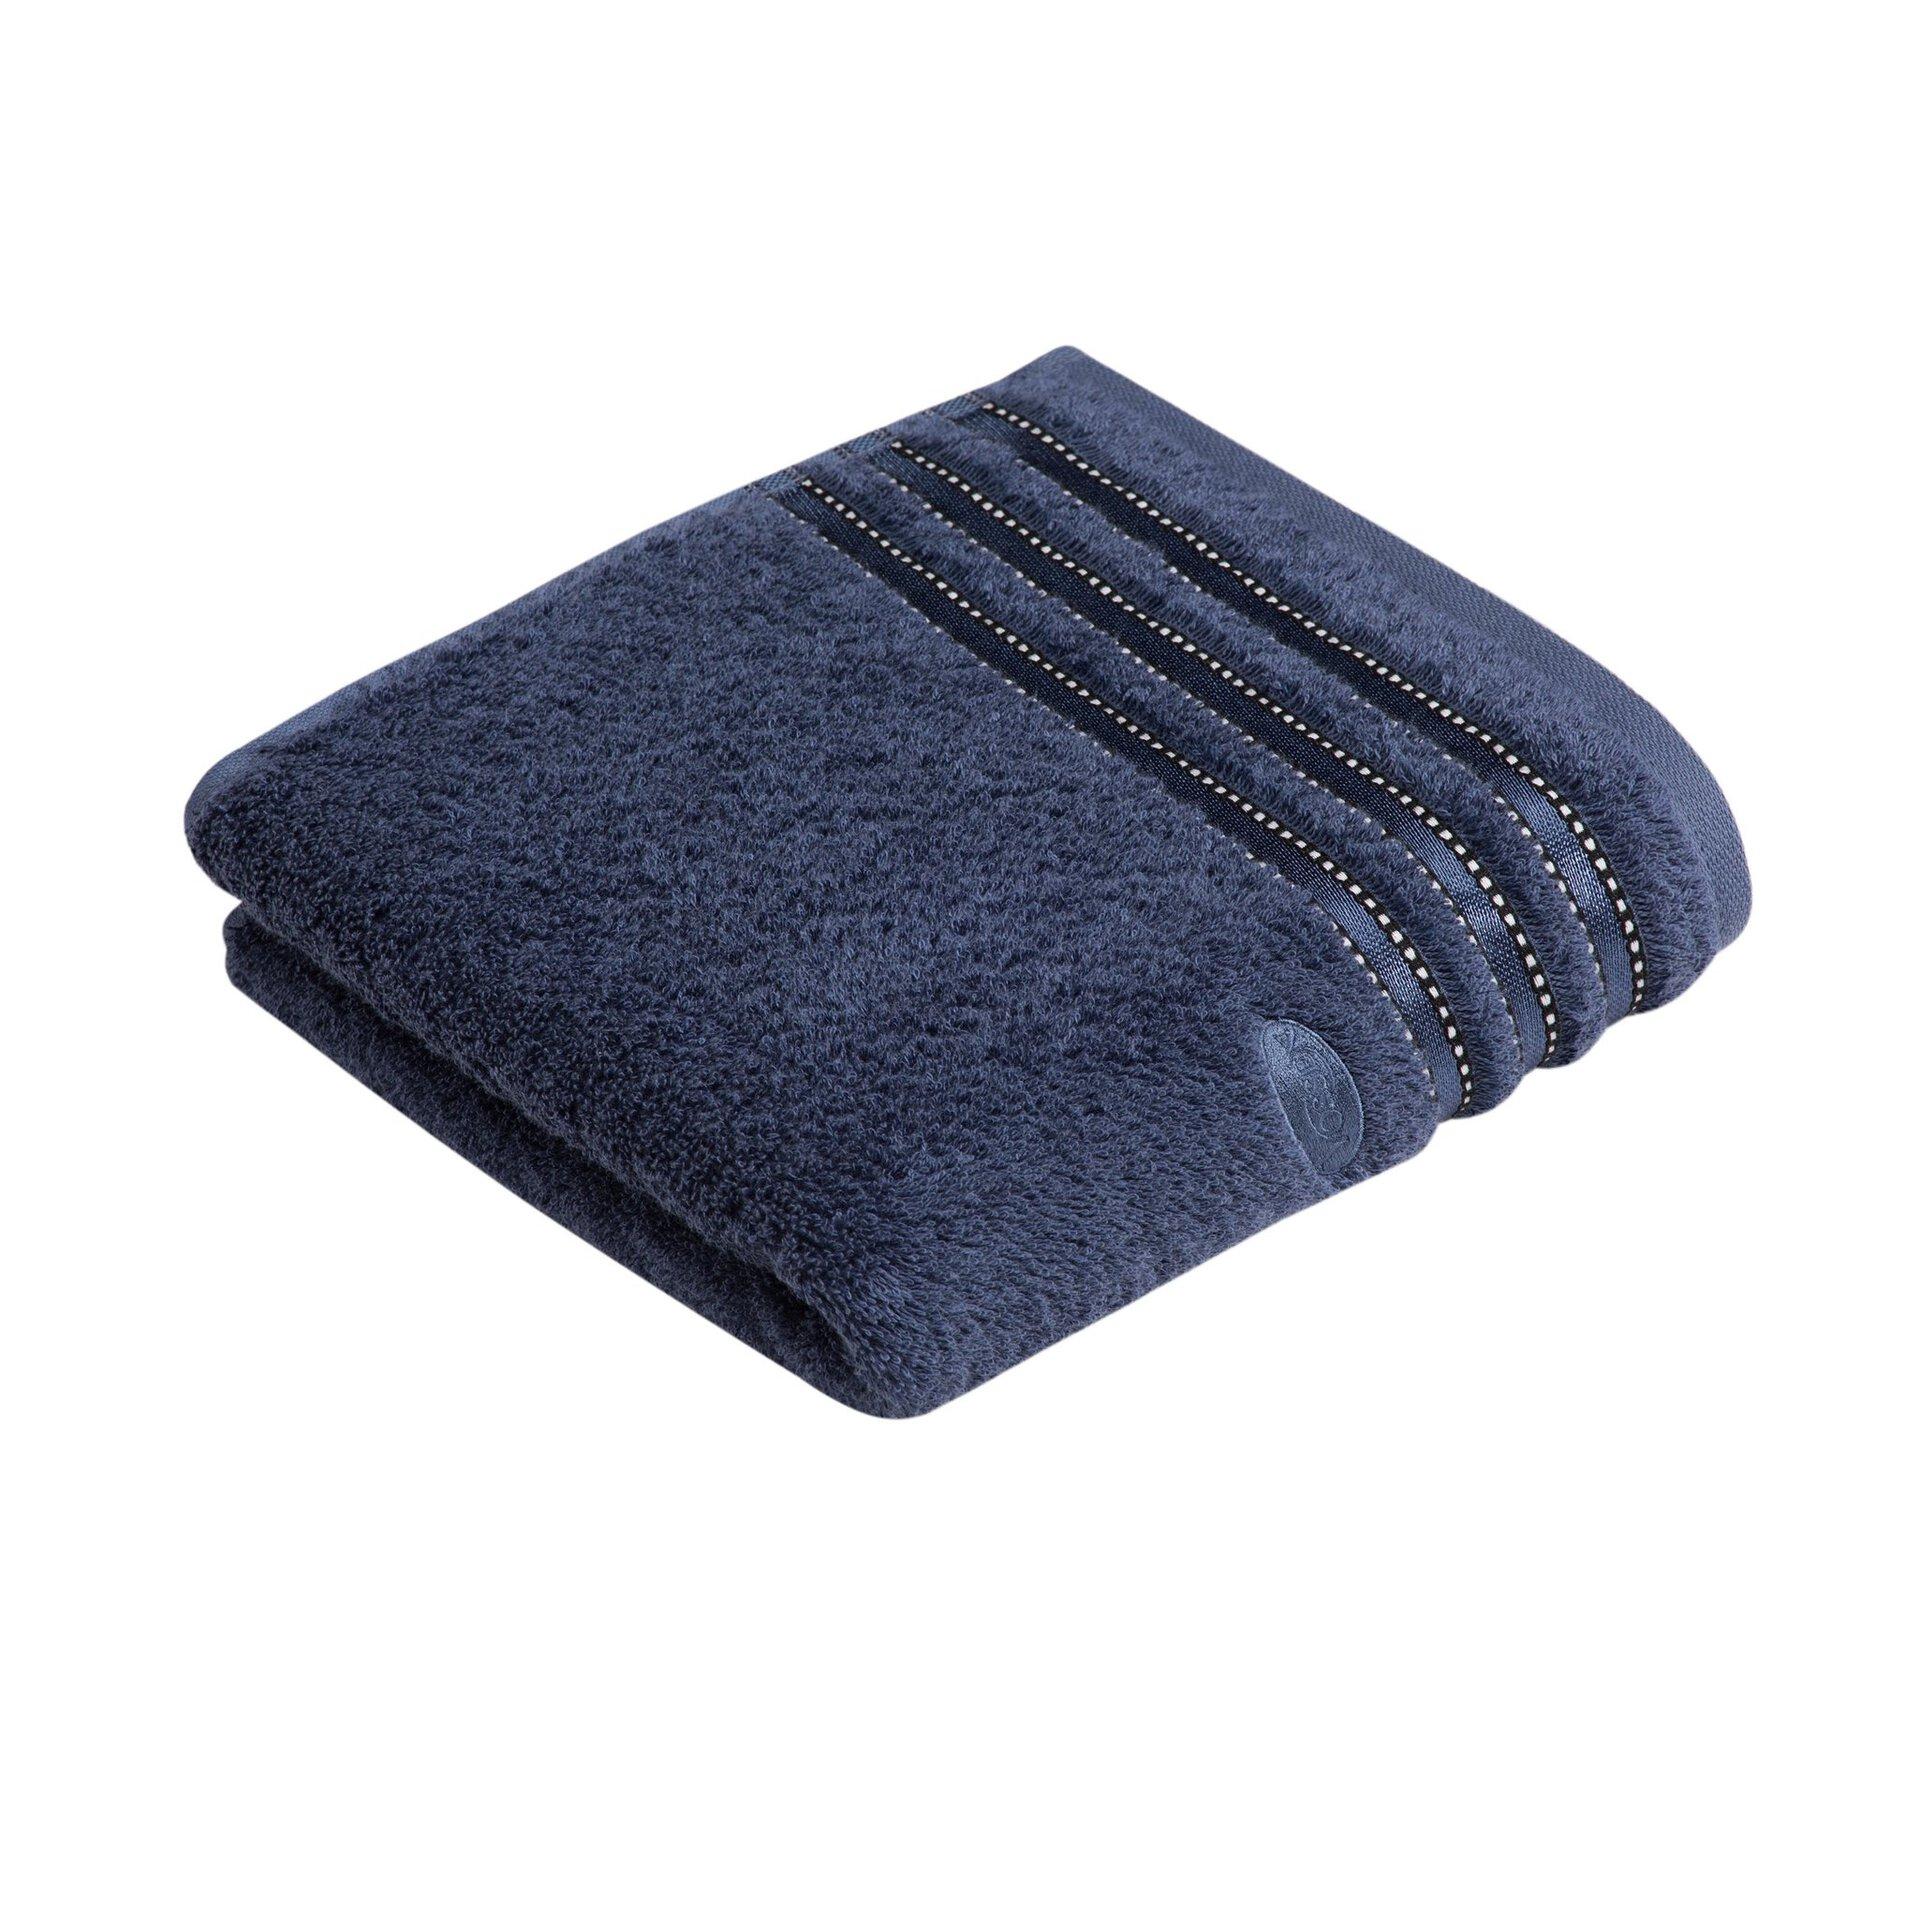 Handtuch Cult de Luxe Vossen Textil 1 x 1 cm